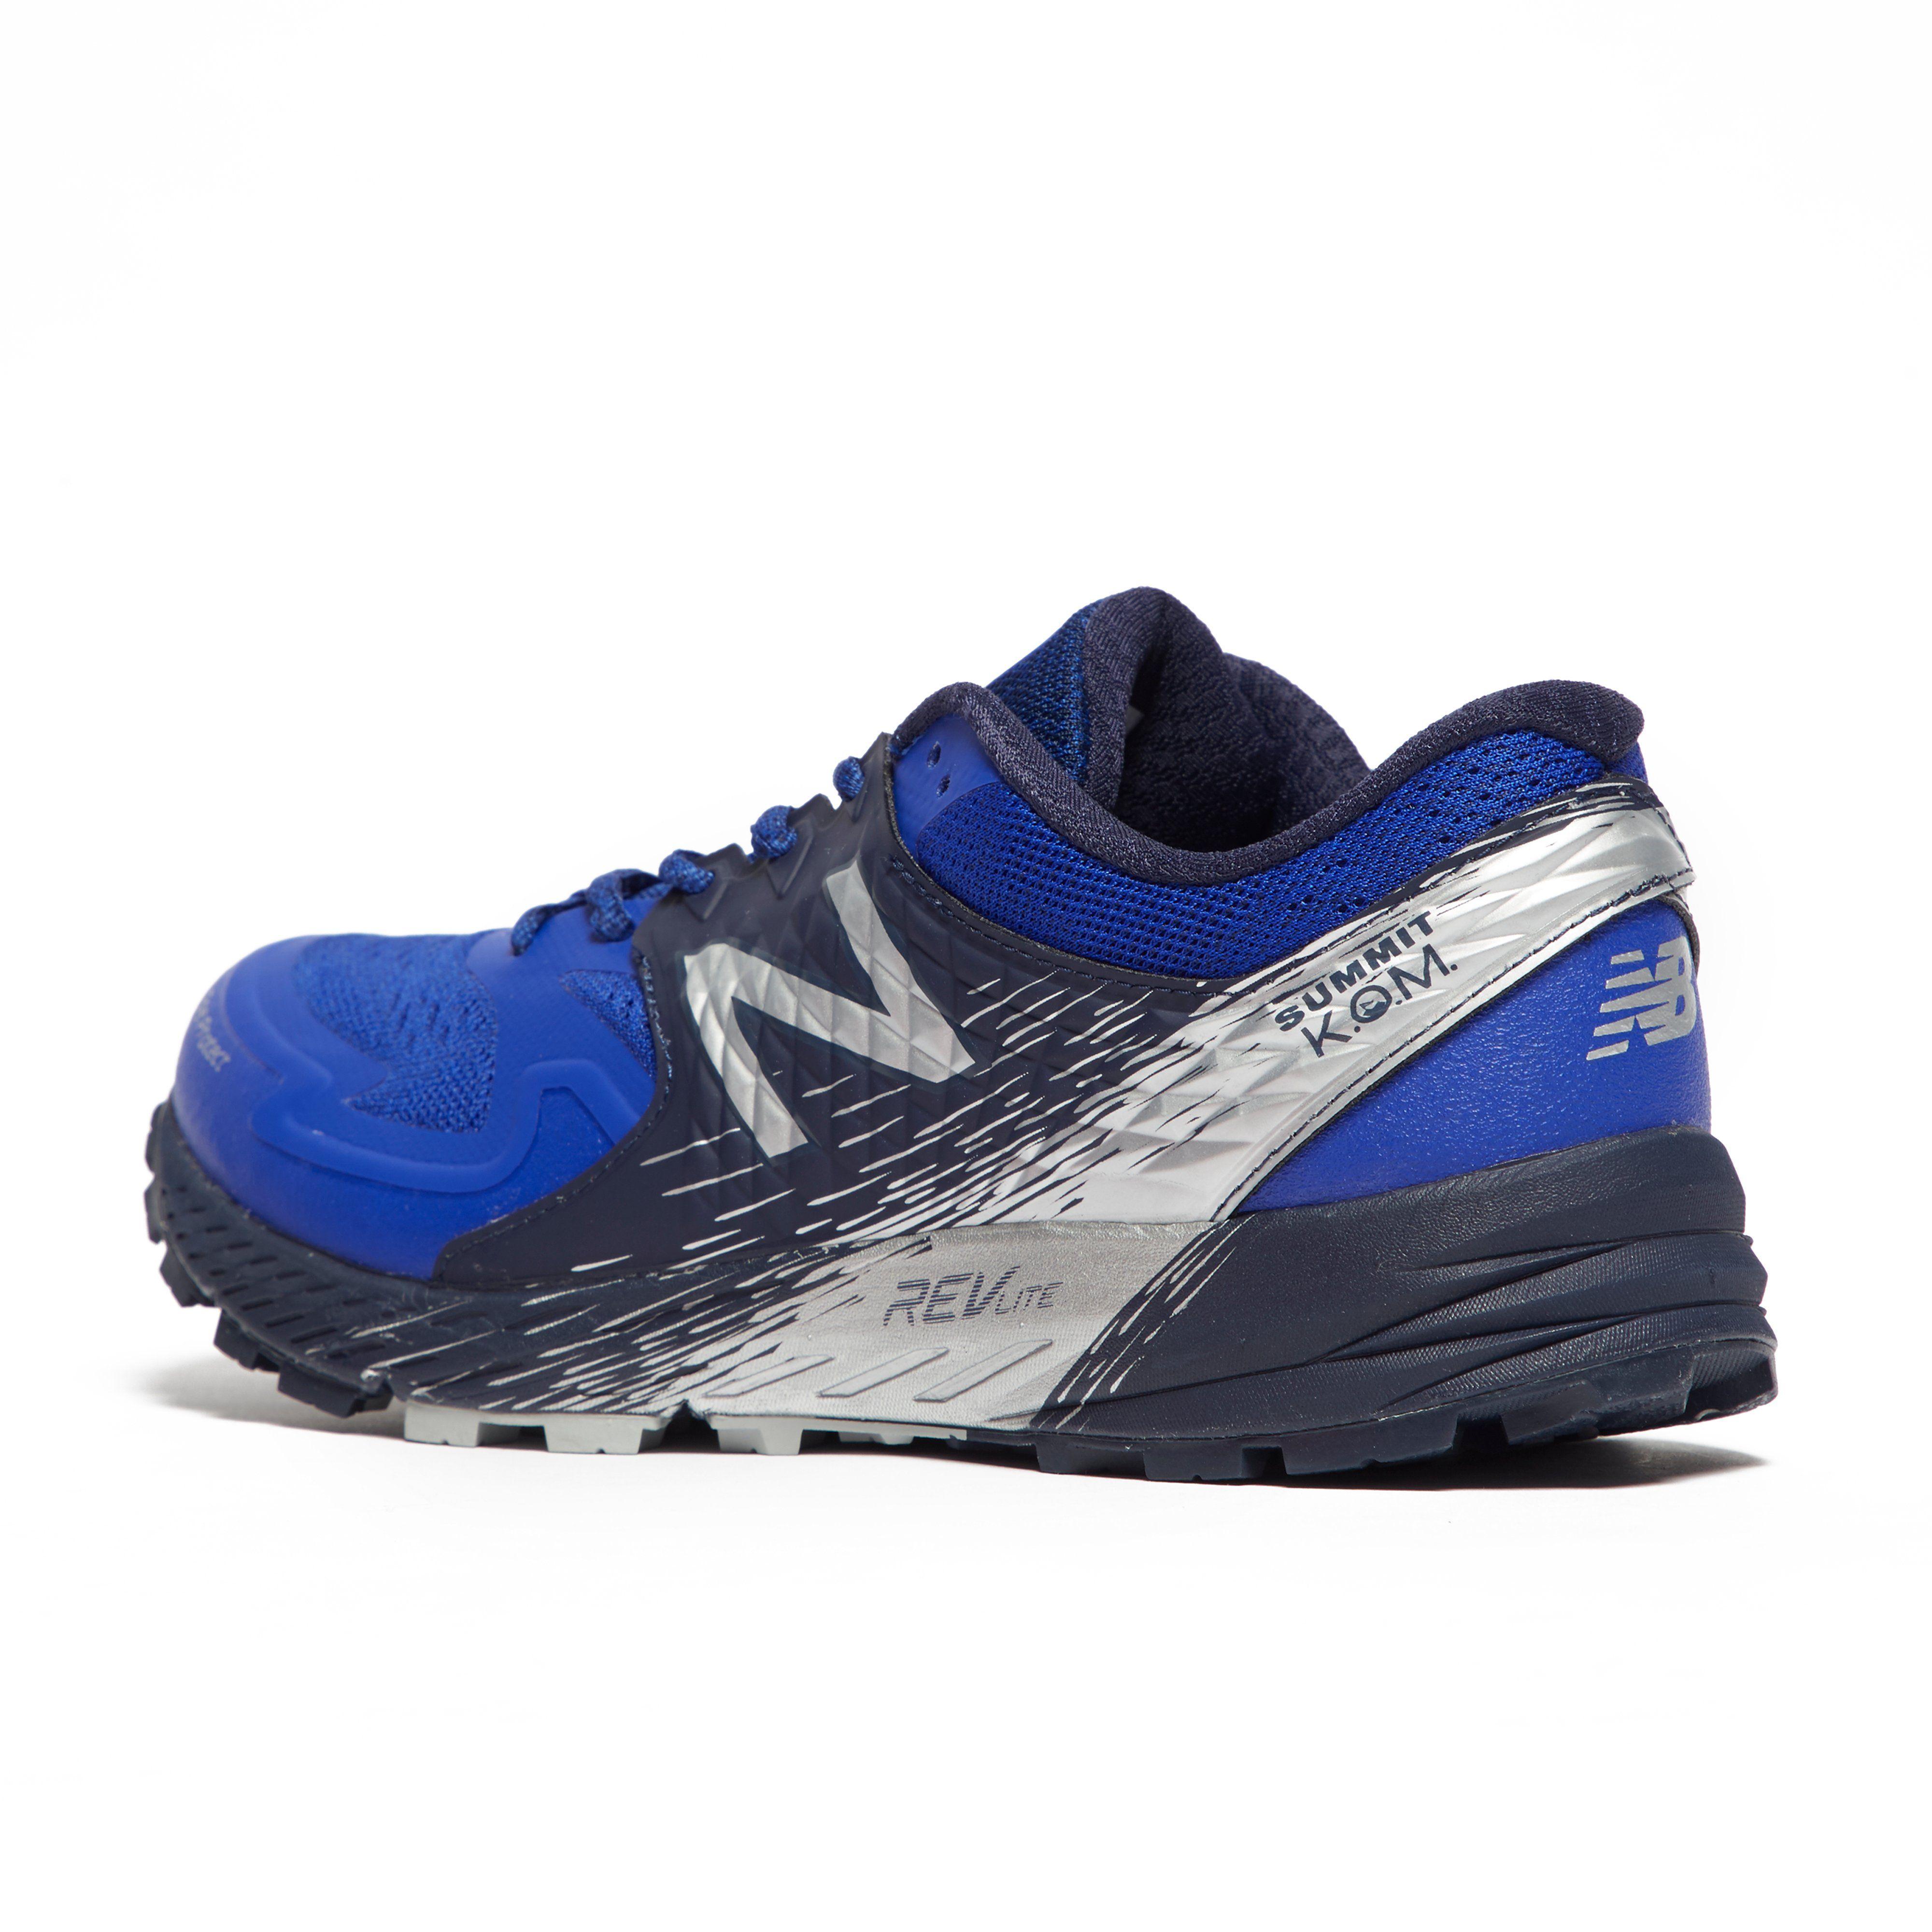 New Balance Summit K.O.M. Men's Trail Running Shoes